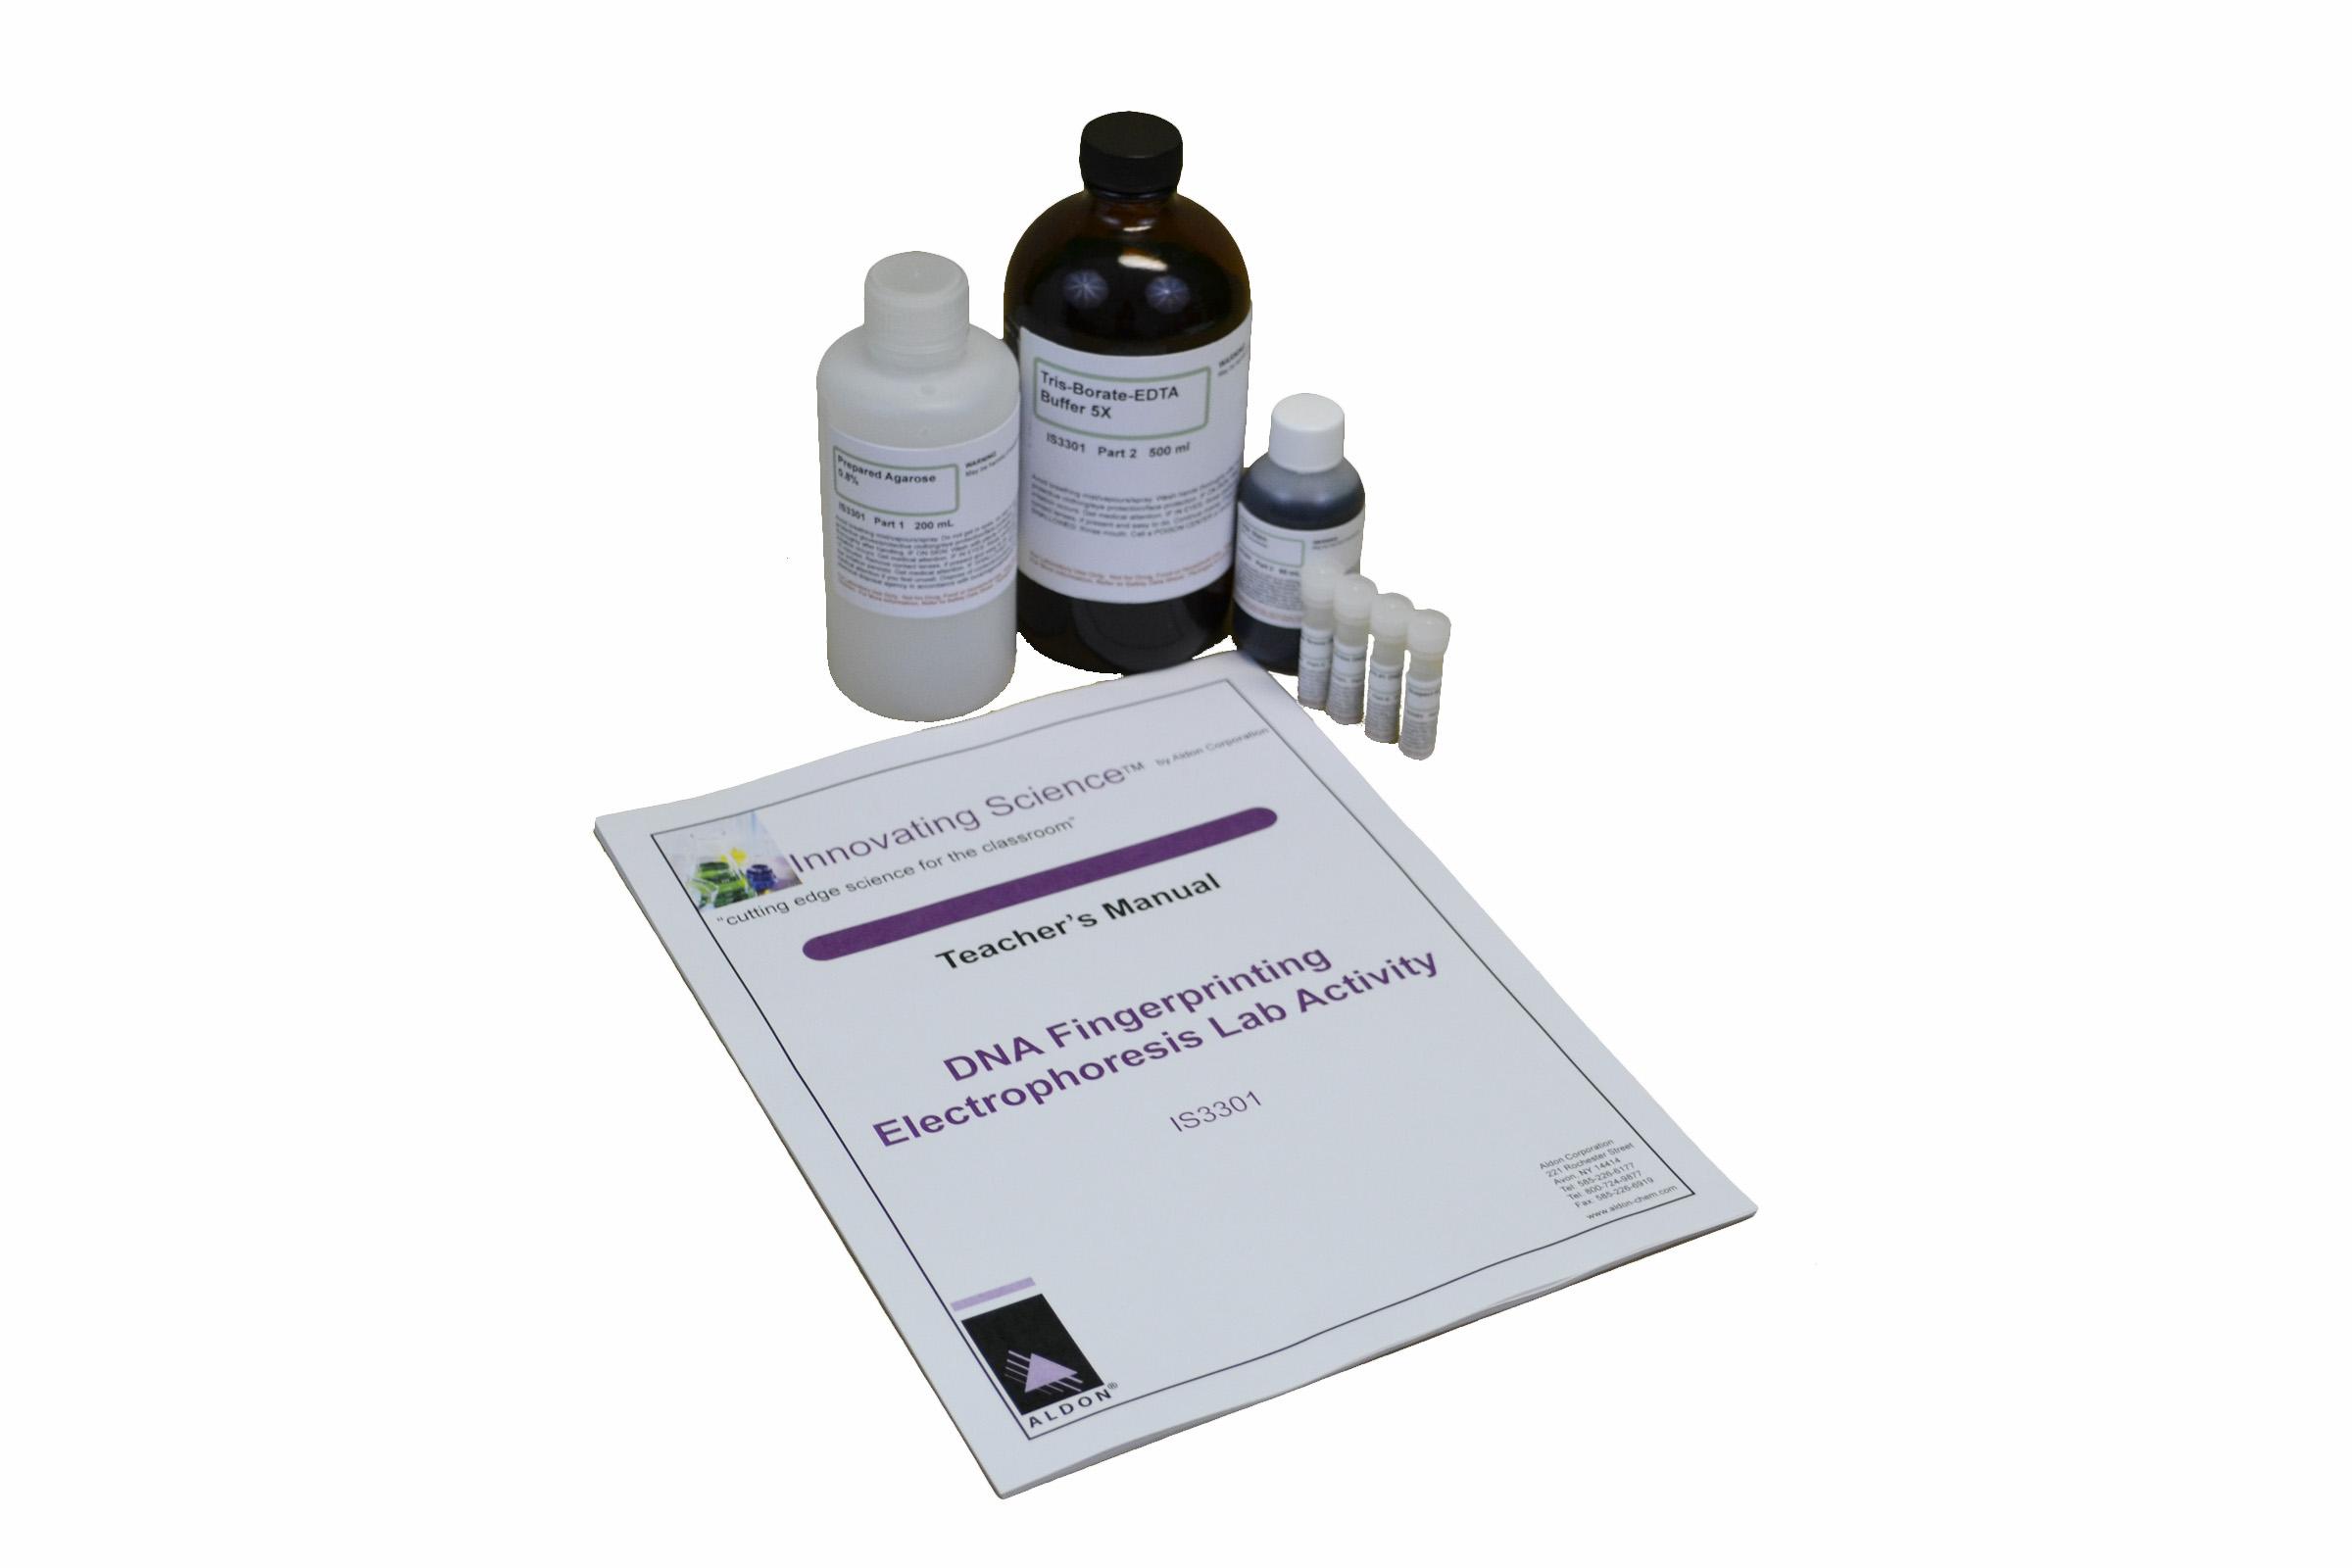 Dna Fingerprinting Electrophoresis Lab Activity Edulab